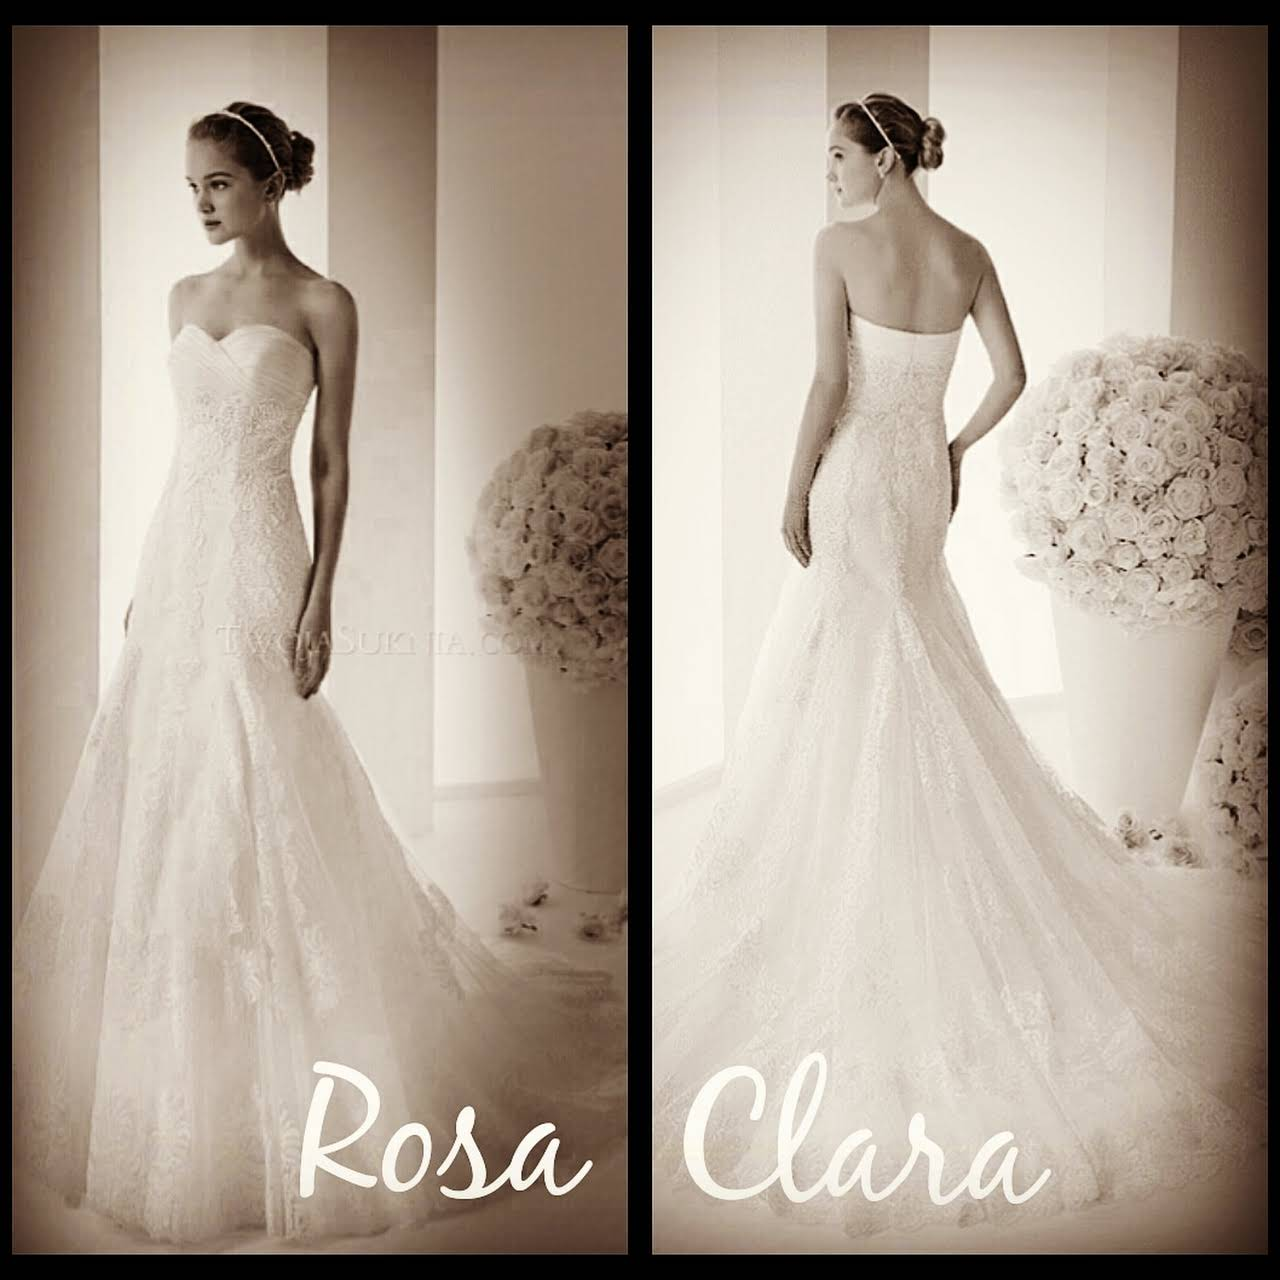 I Do Designer Bridal Consignment Consignment Shop In Chicago